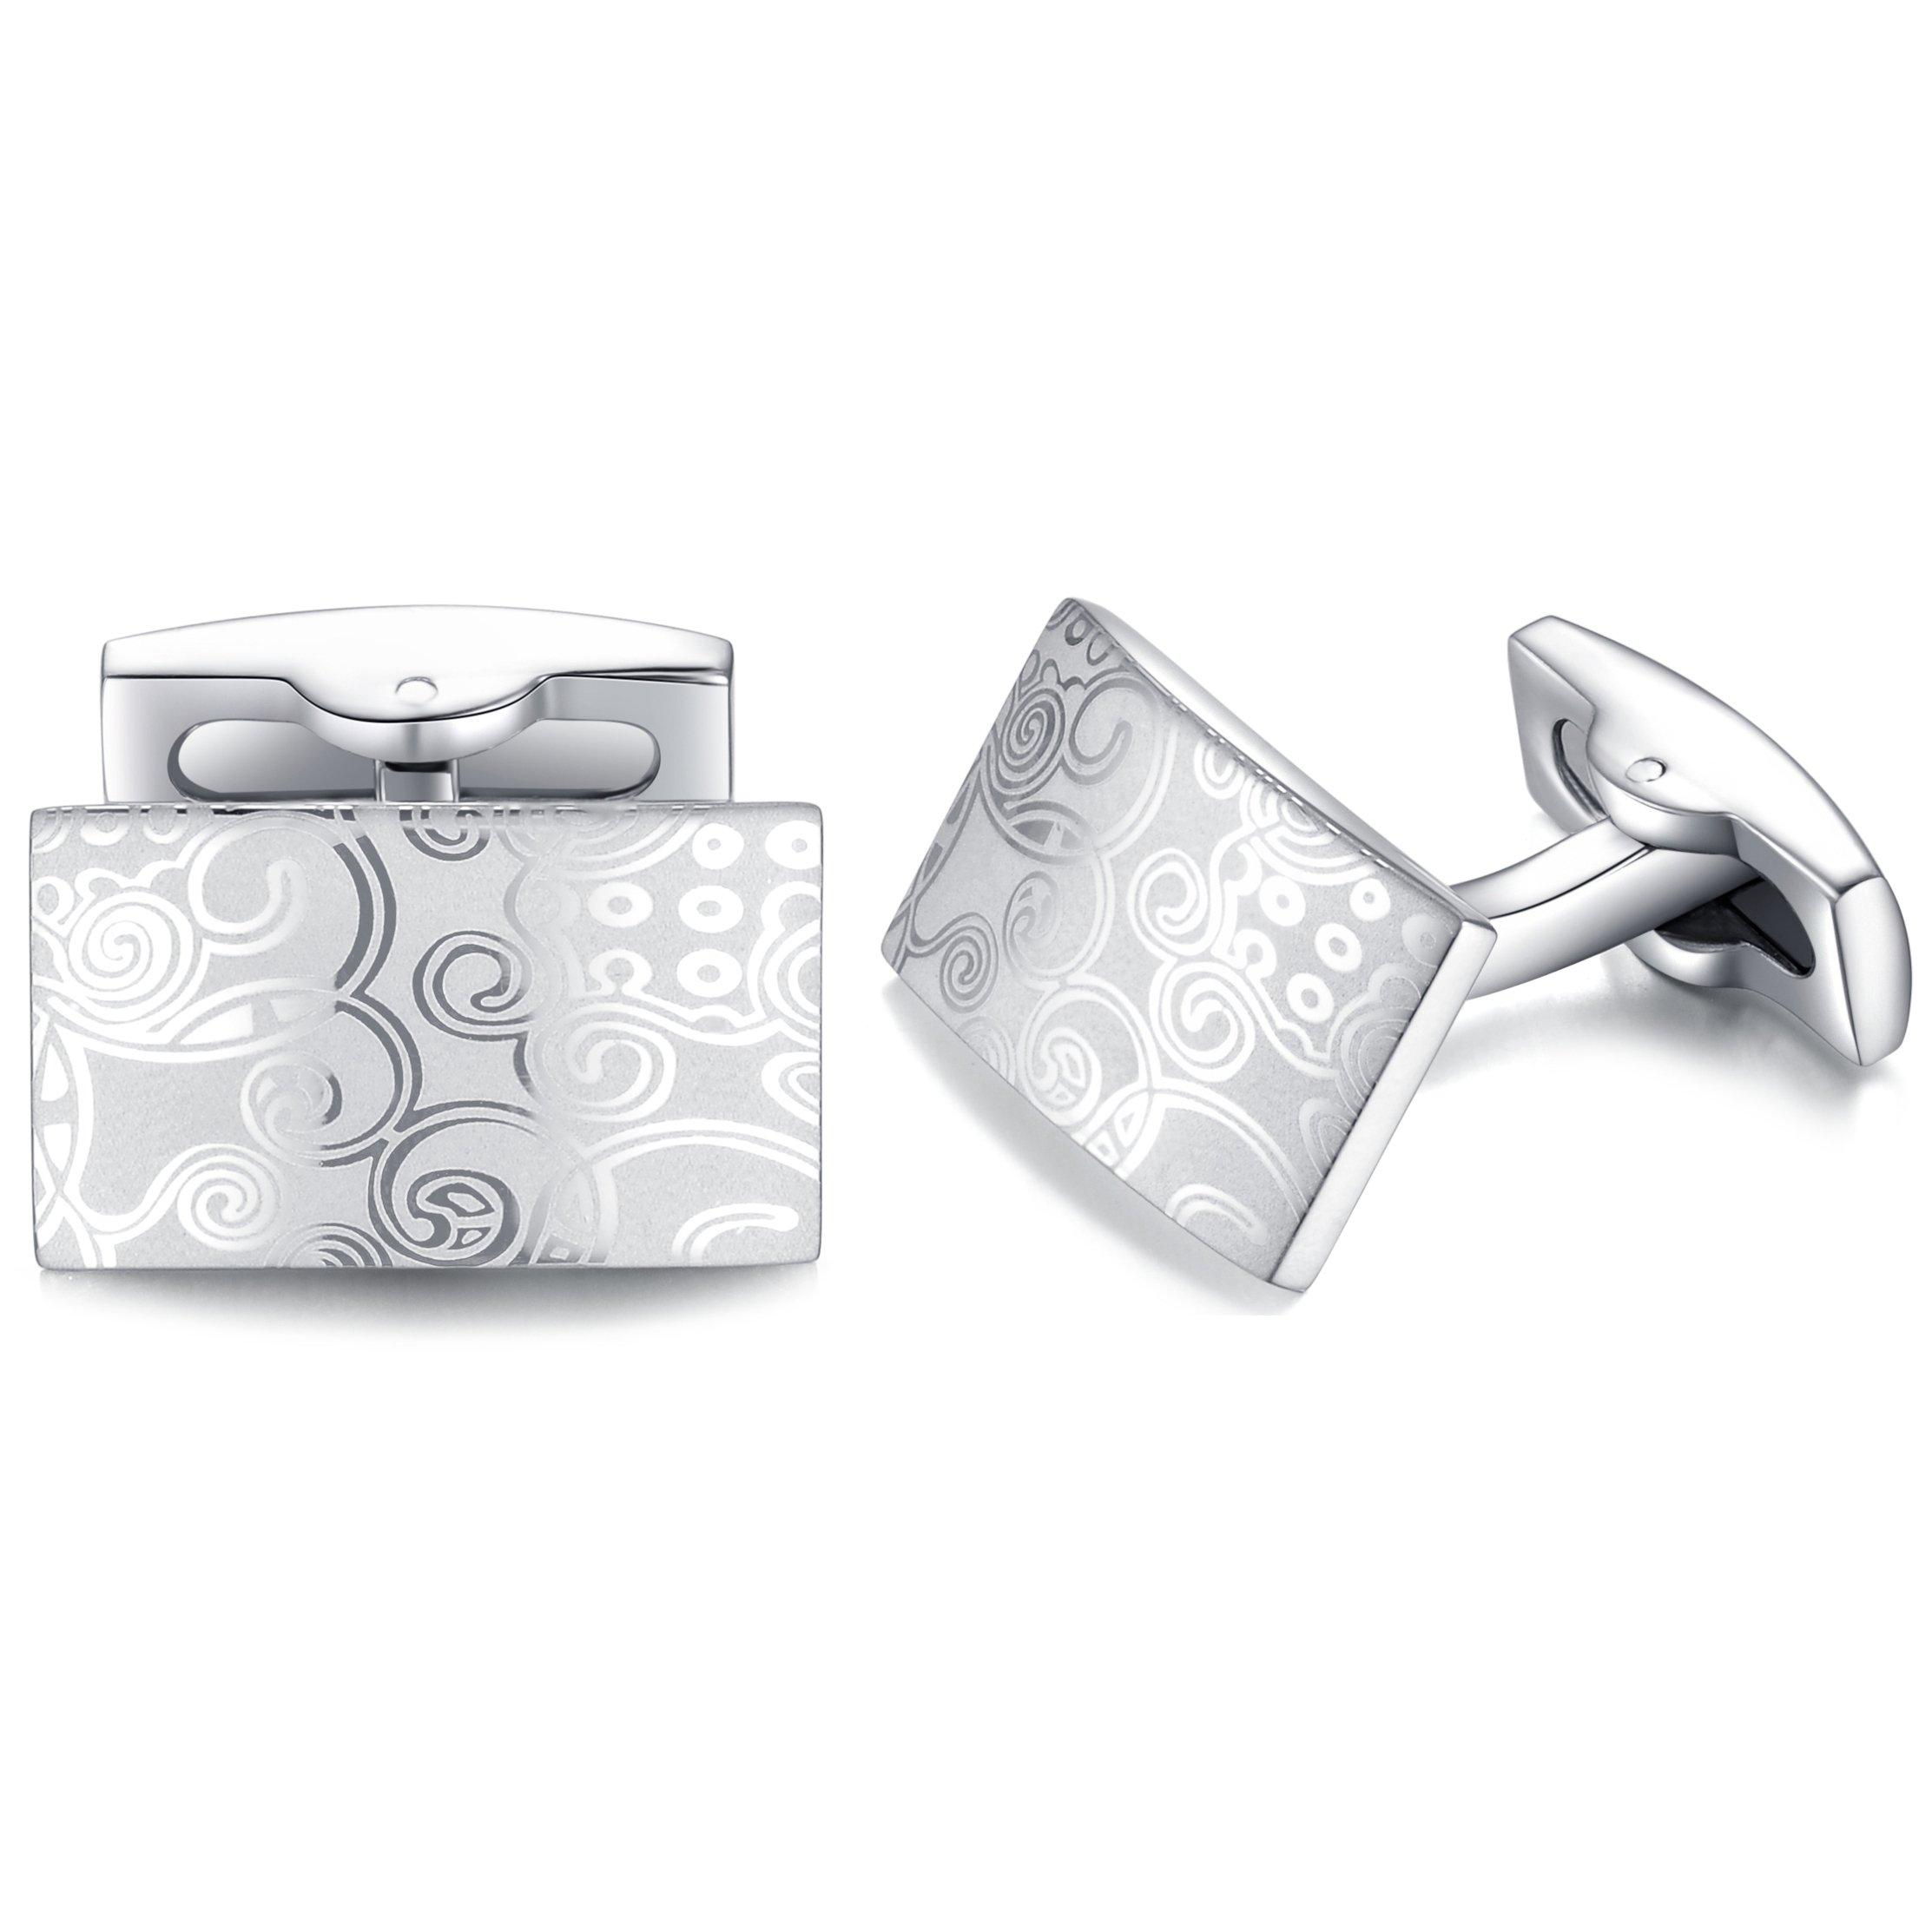 HONEY BEAR Rectangle Cufflinks Tie Clip Set for Mens Business Wedding Gift